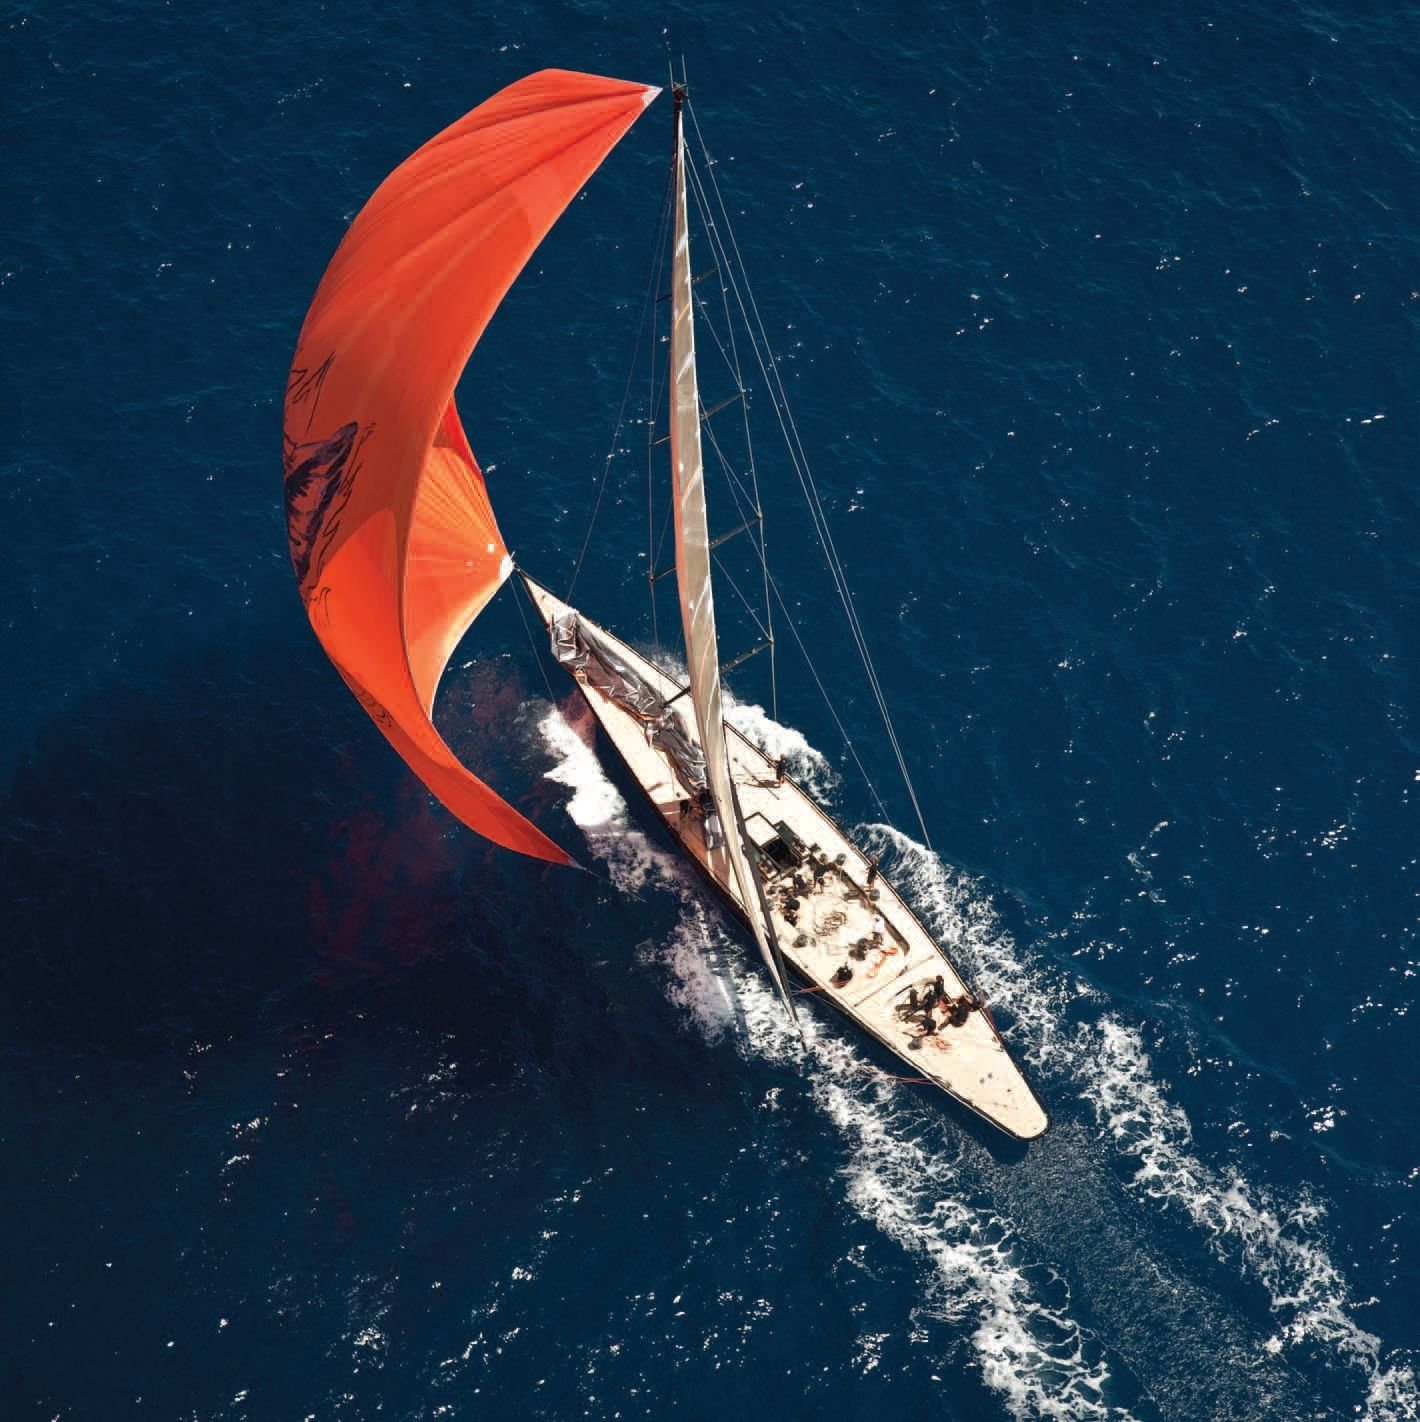 F-Class Yacht Firefly